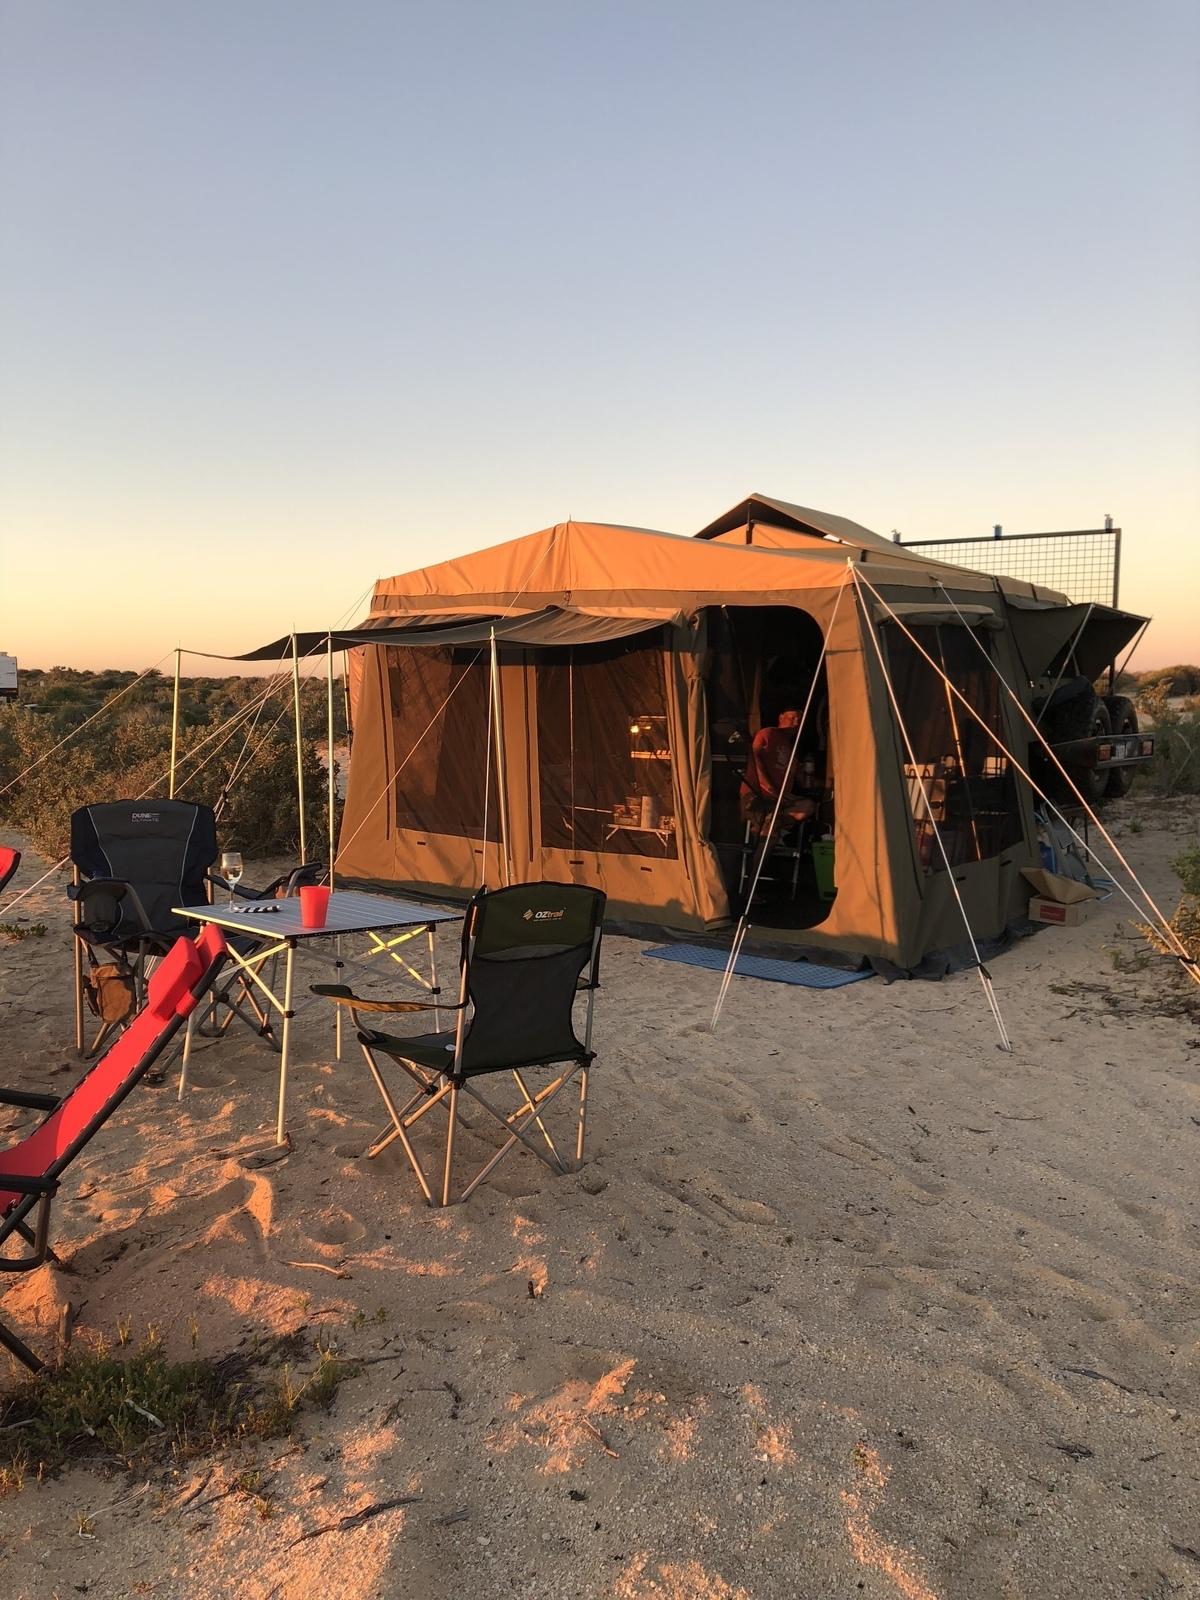 Camper adventures - Cover Image